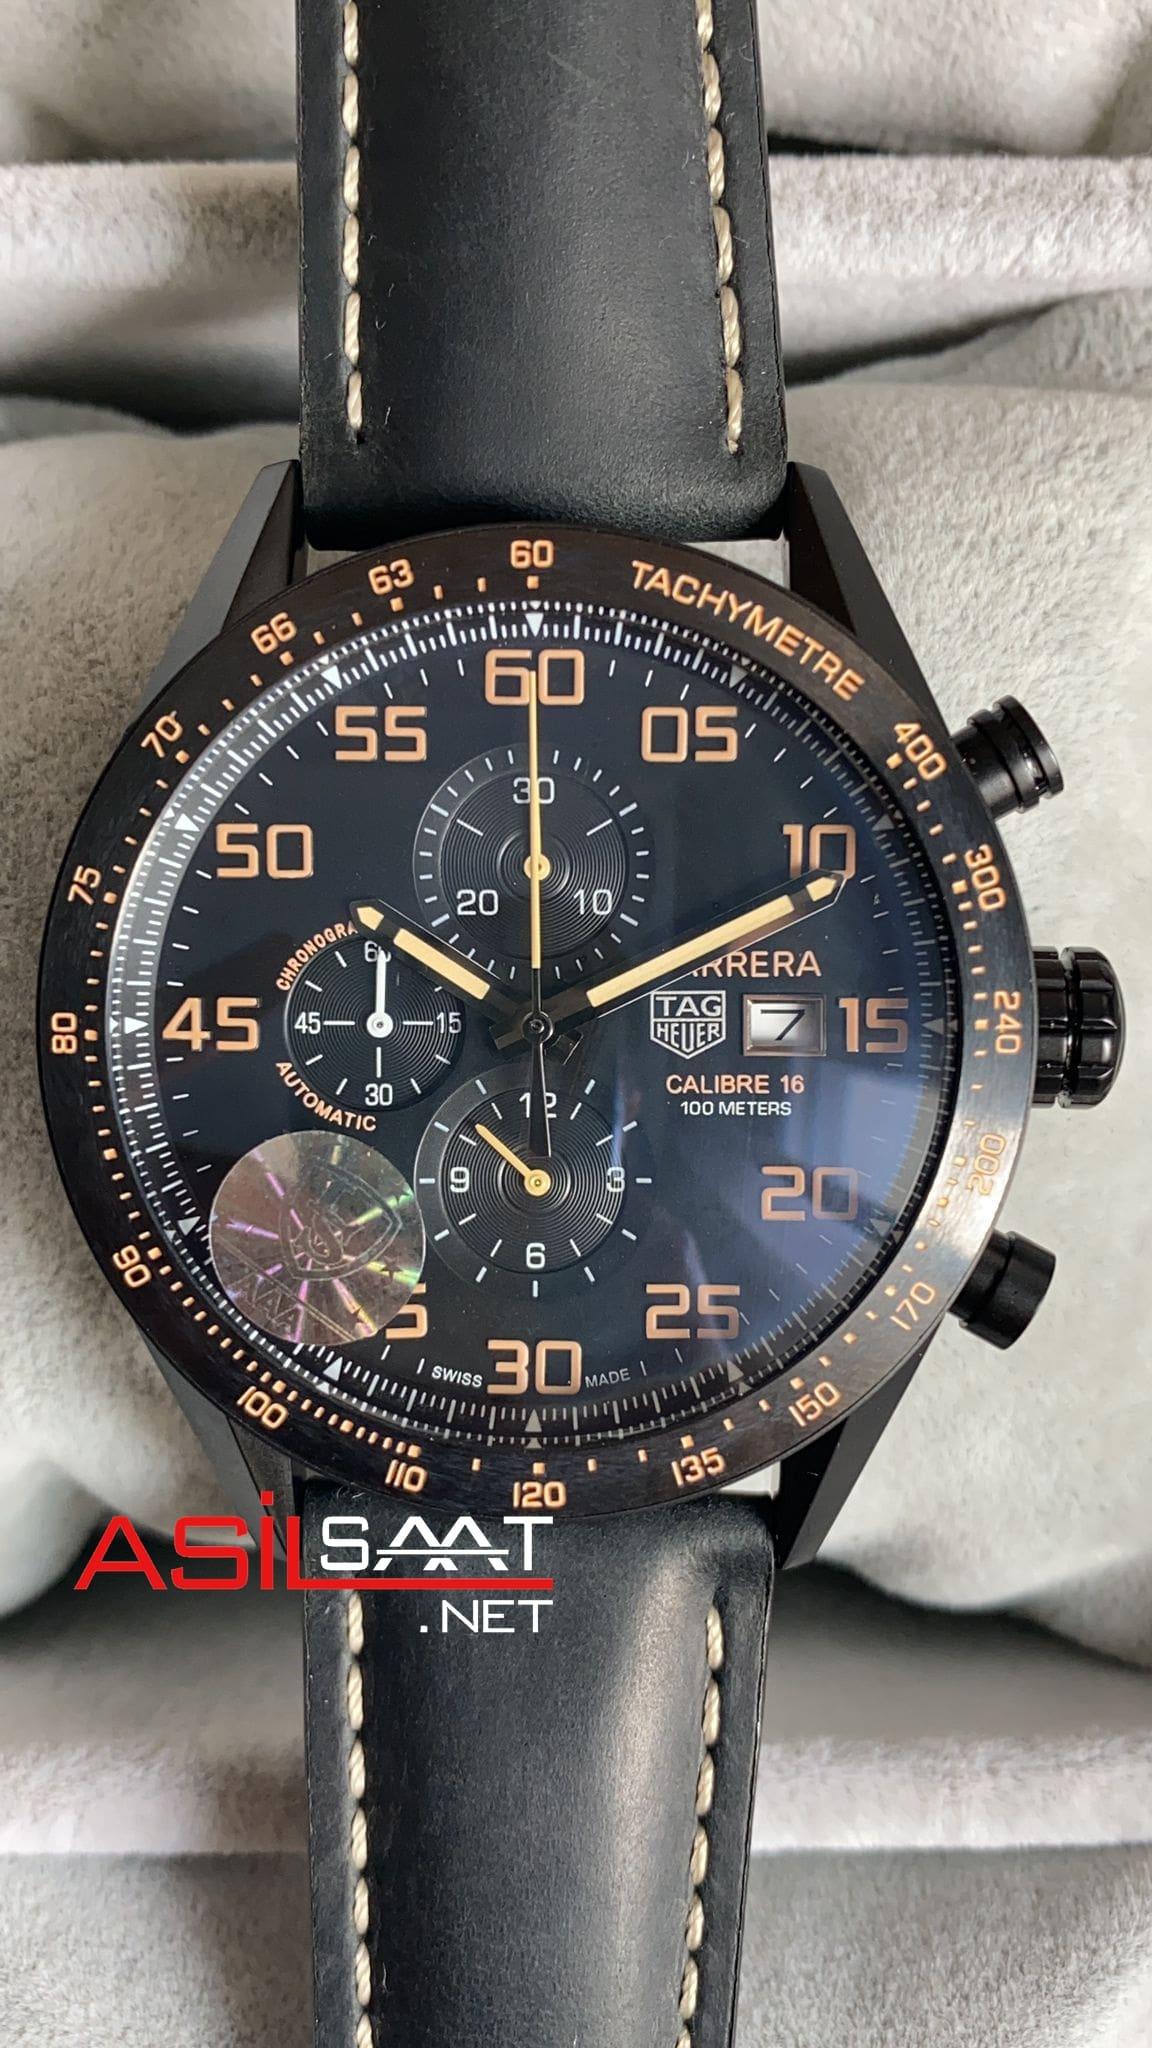 TAG Heuer Carrera Calibre16 Black Chronograph Replika Saat TAGC16010